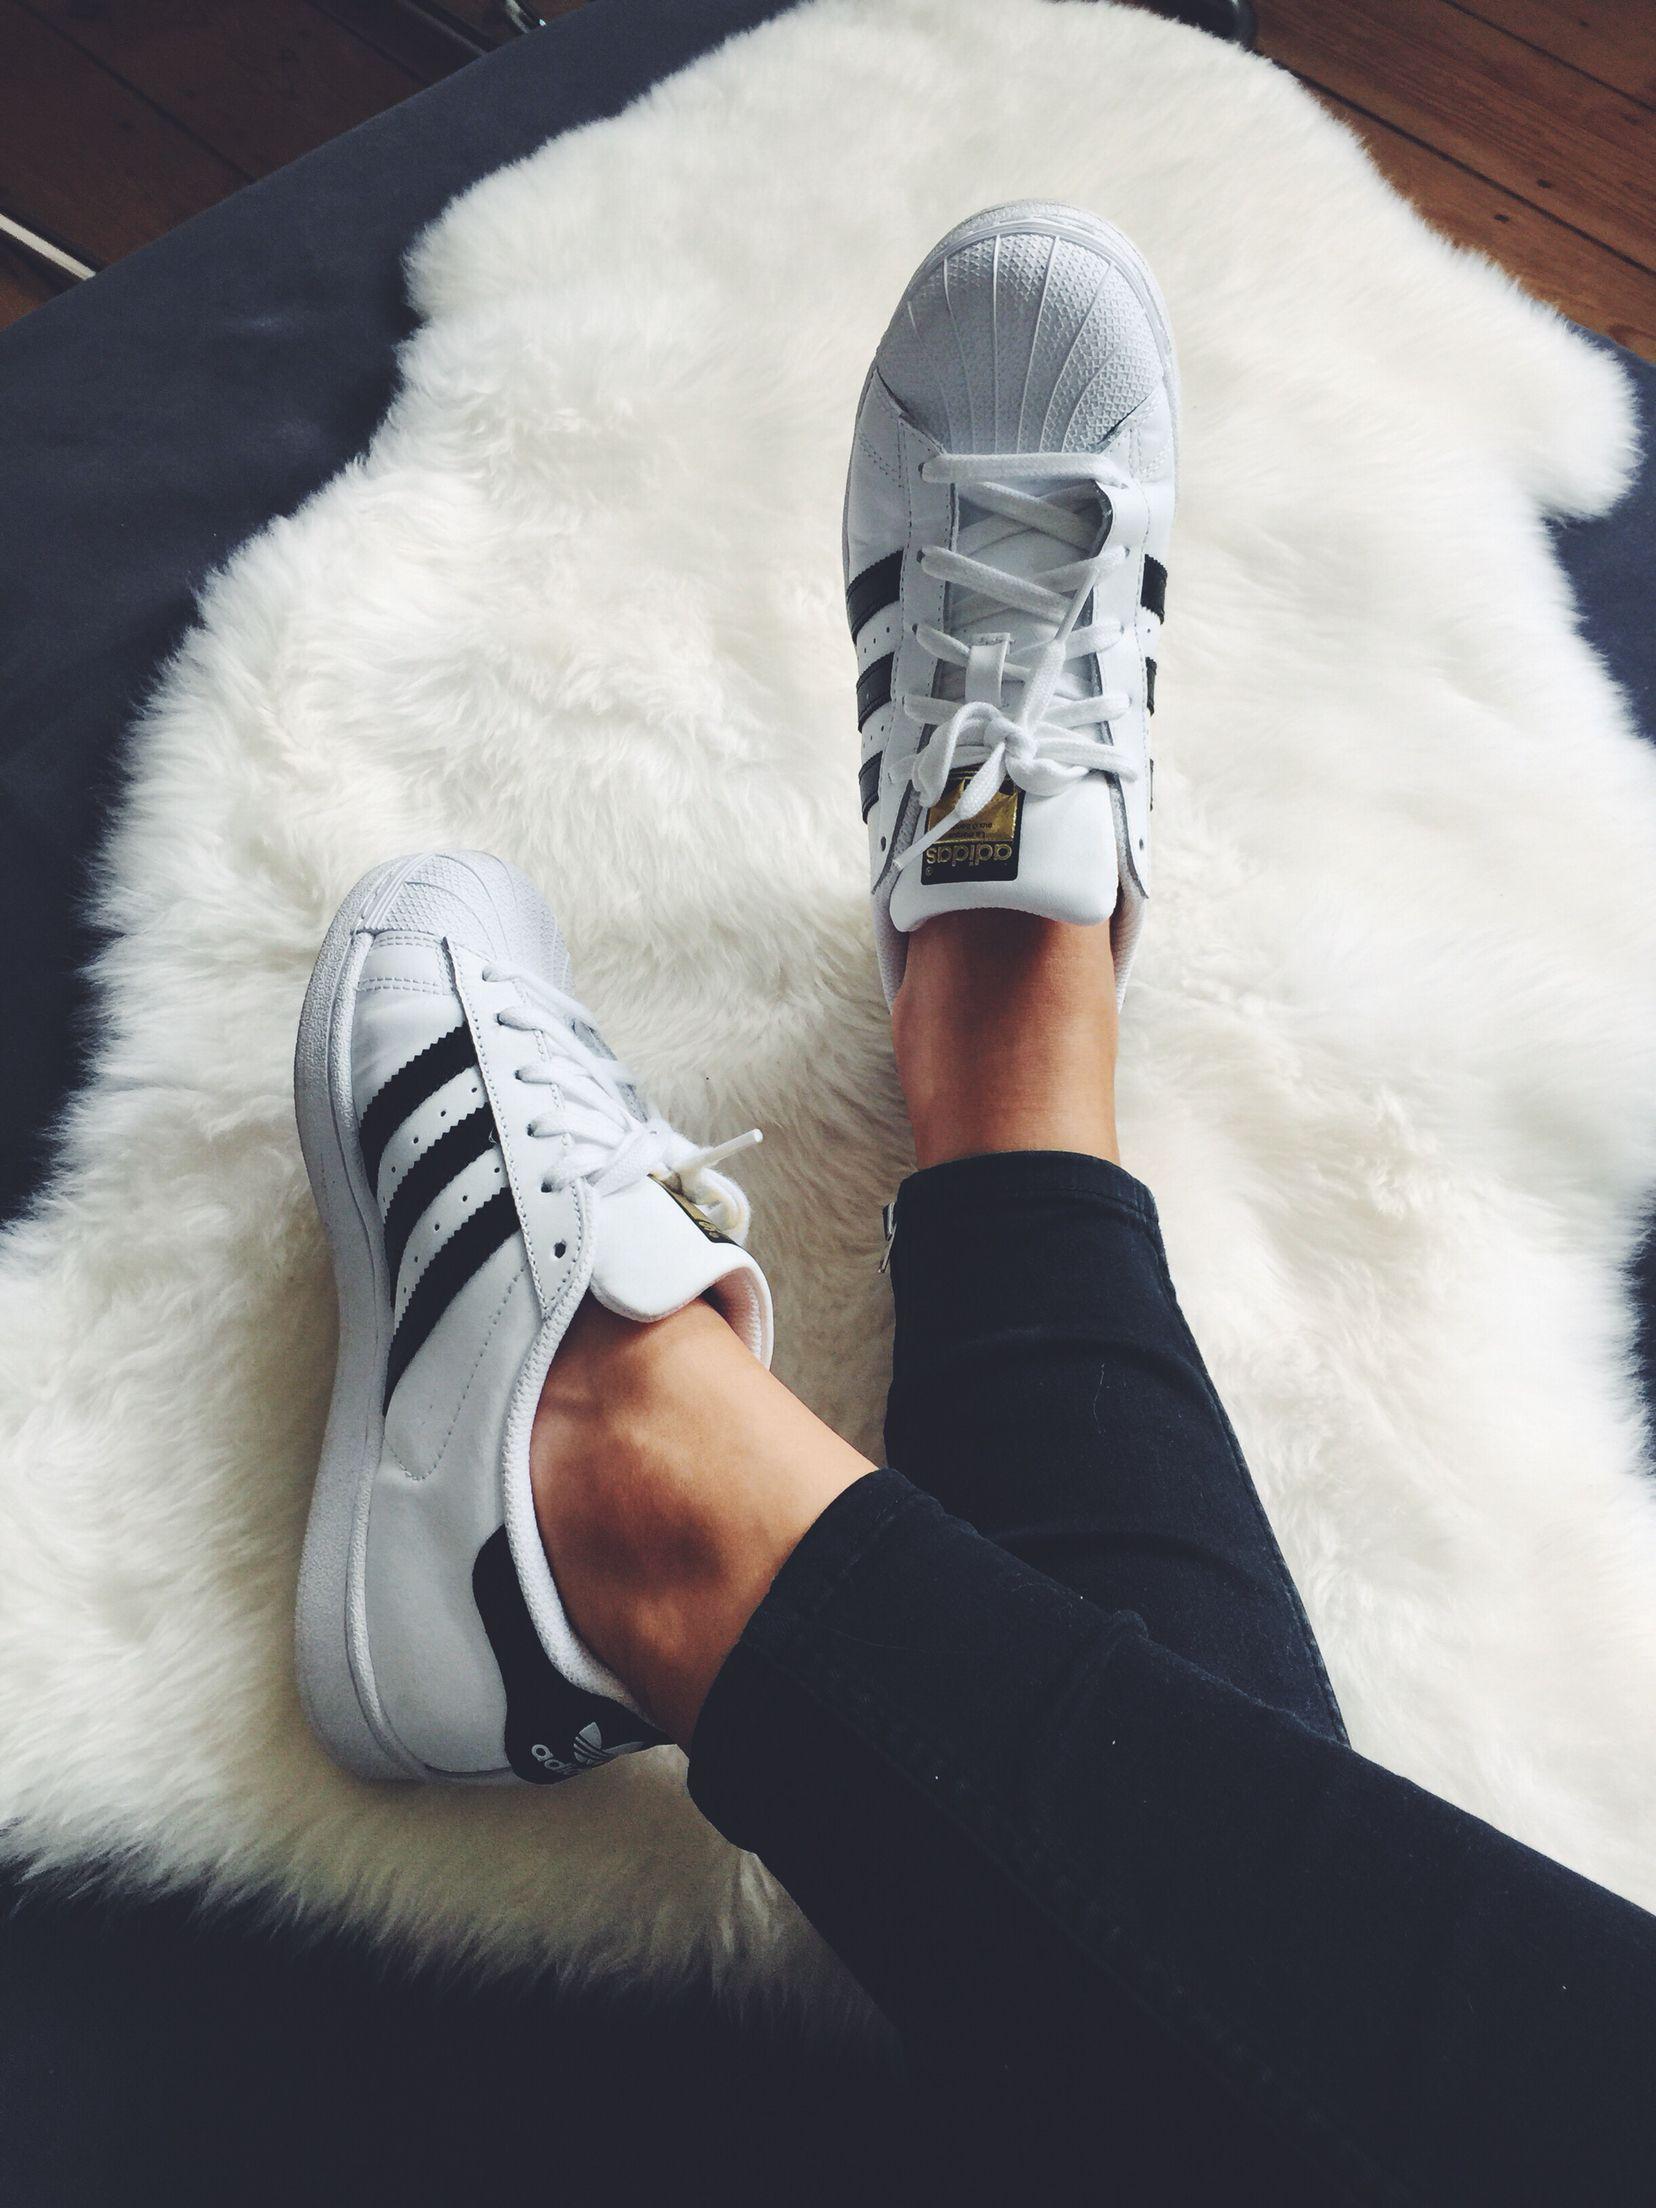 Fishnet socks with Adidas Superstar Sneakers Insagram